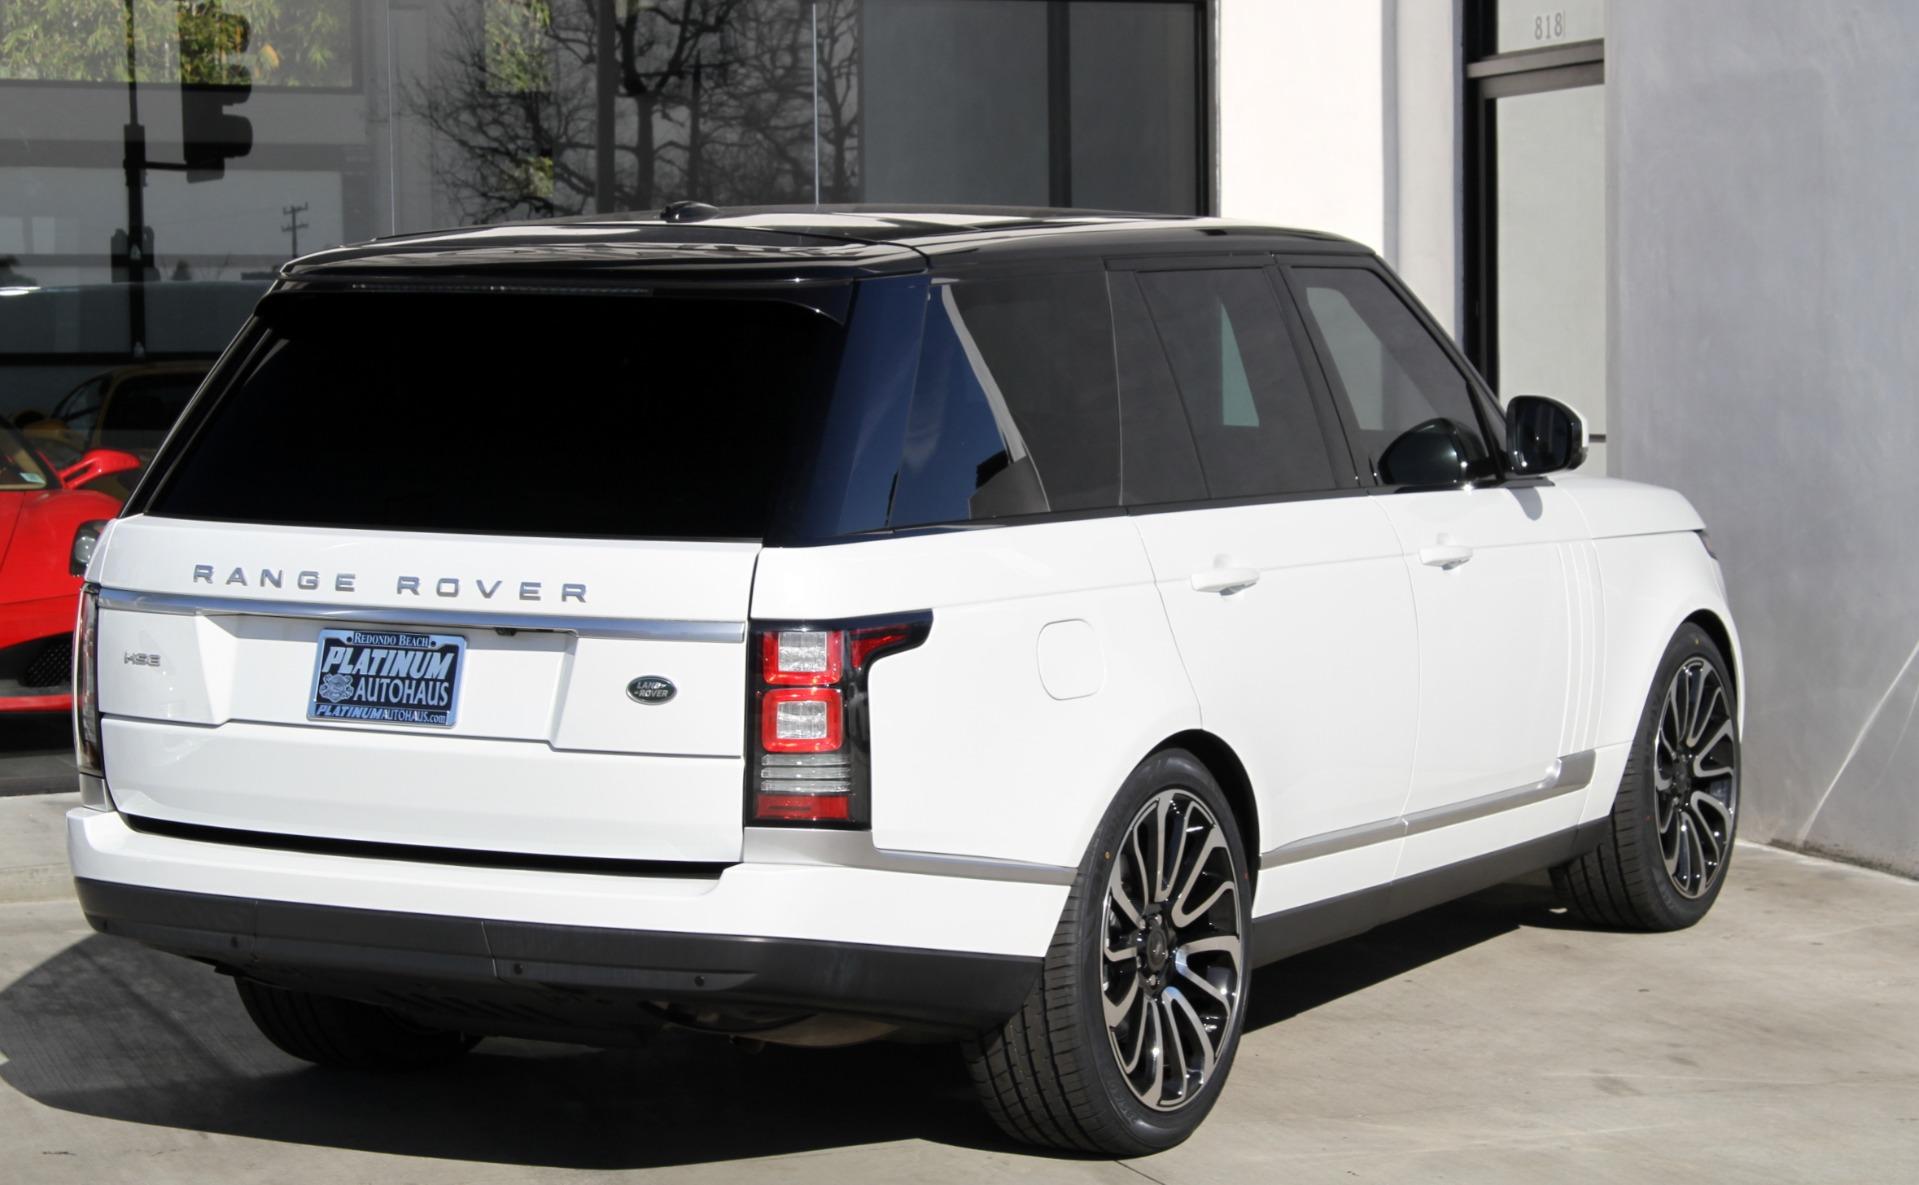 Land Rover For Sale Near Me >> 2014 Land Rover Range Rover HSE Stock # 6041 for sale near Redondo Beach, CA | CA Land Rover Dealer